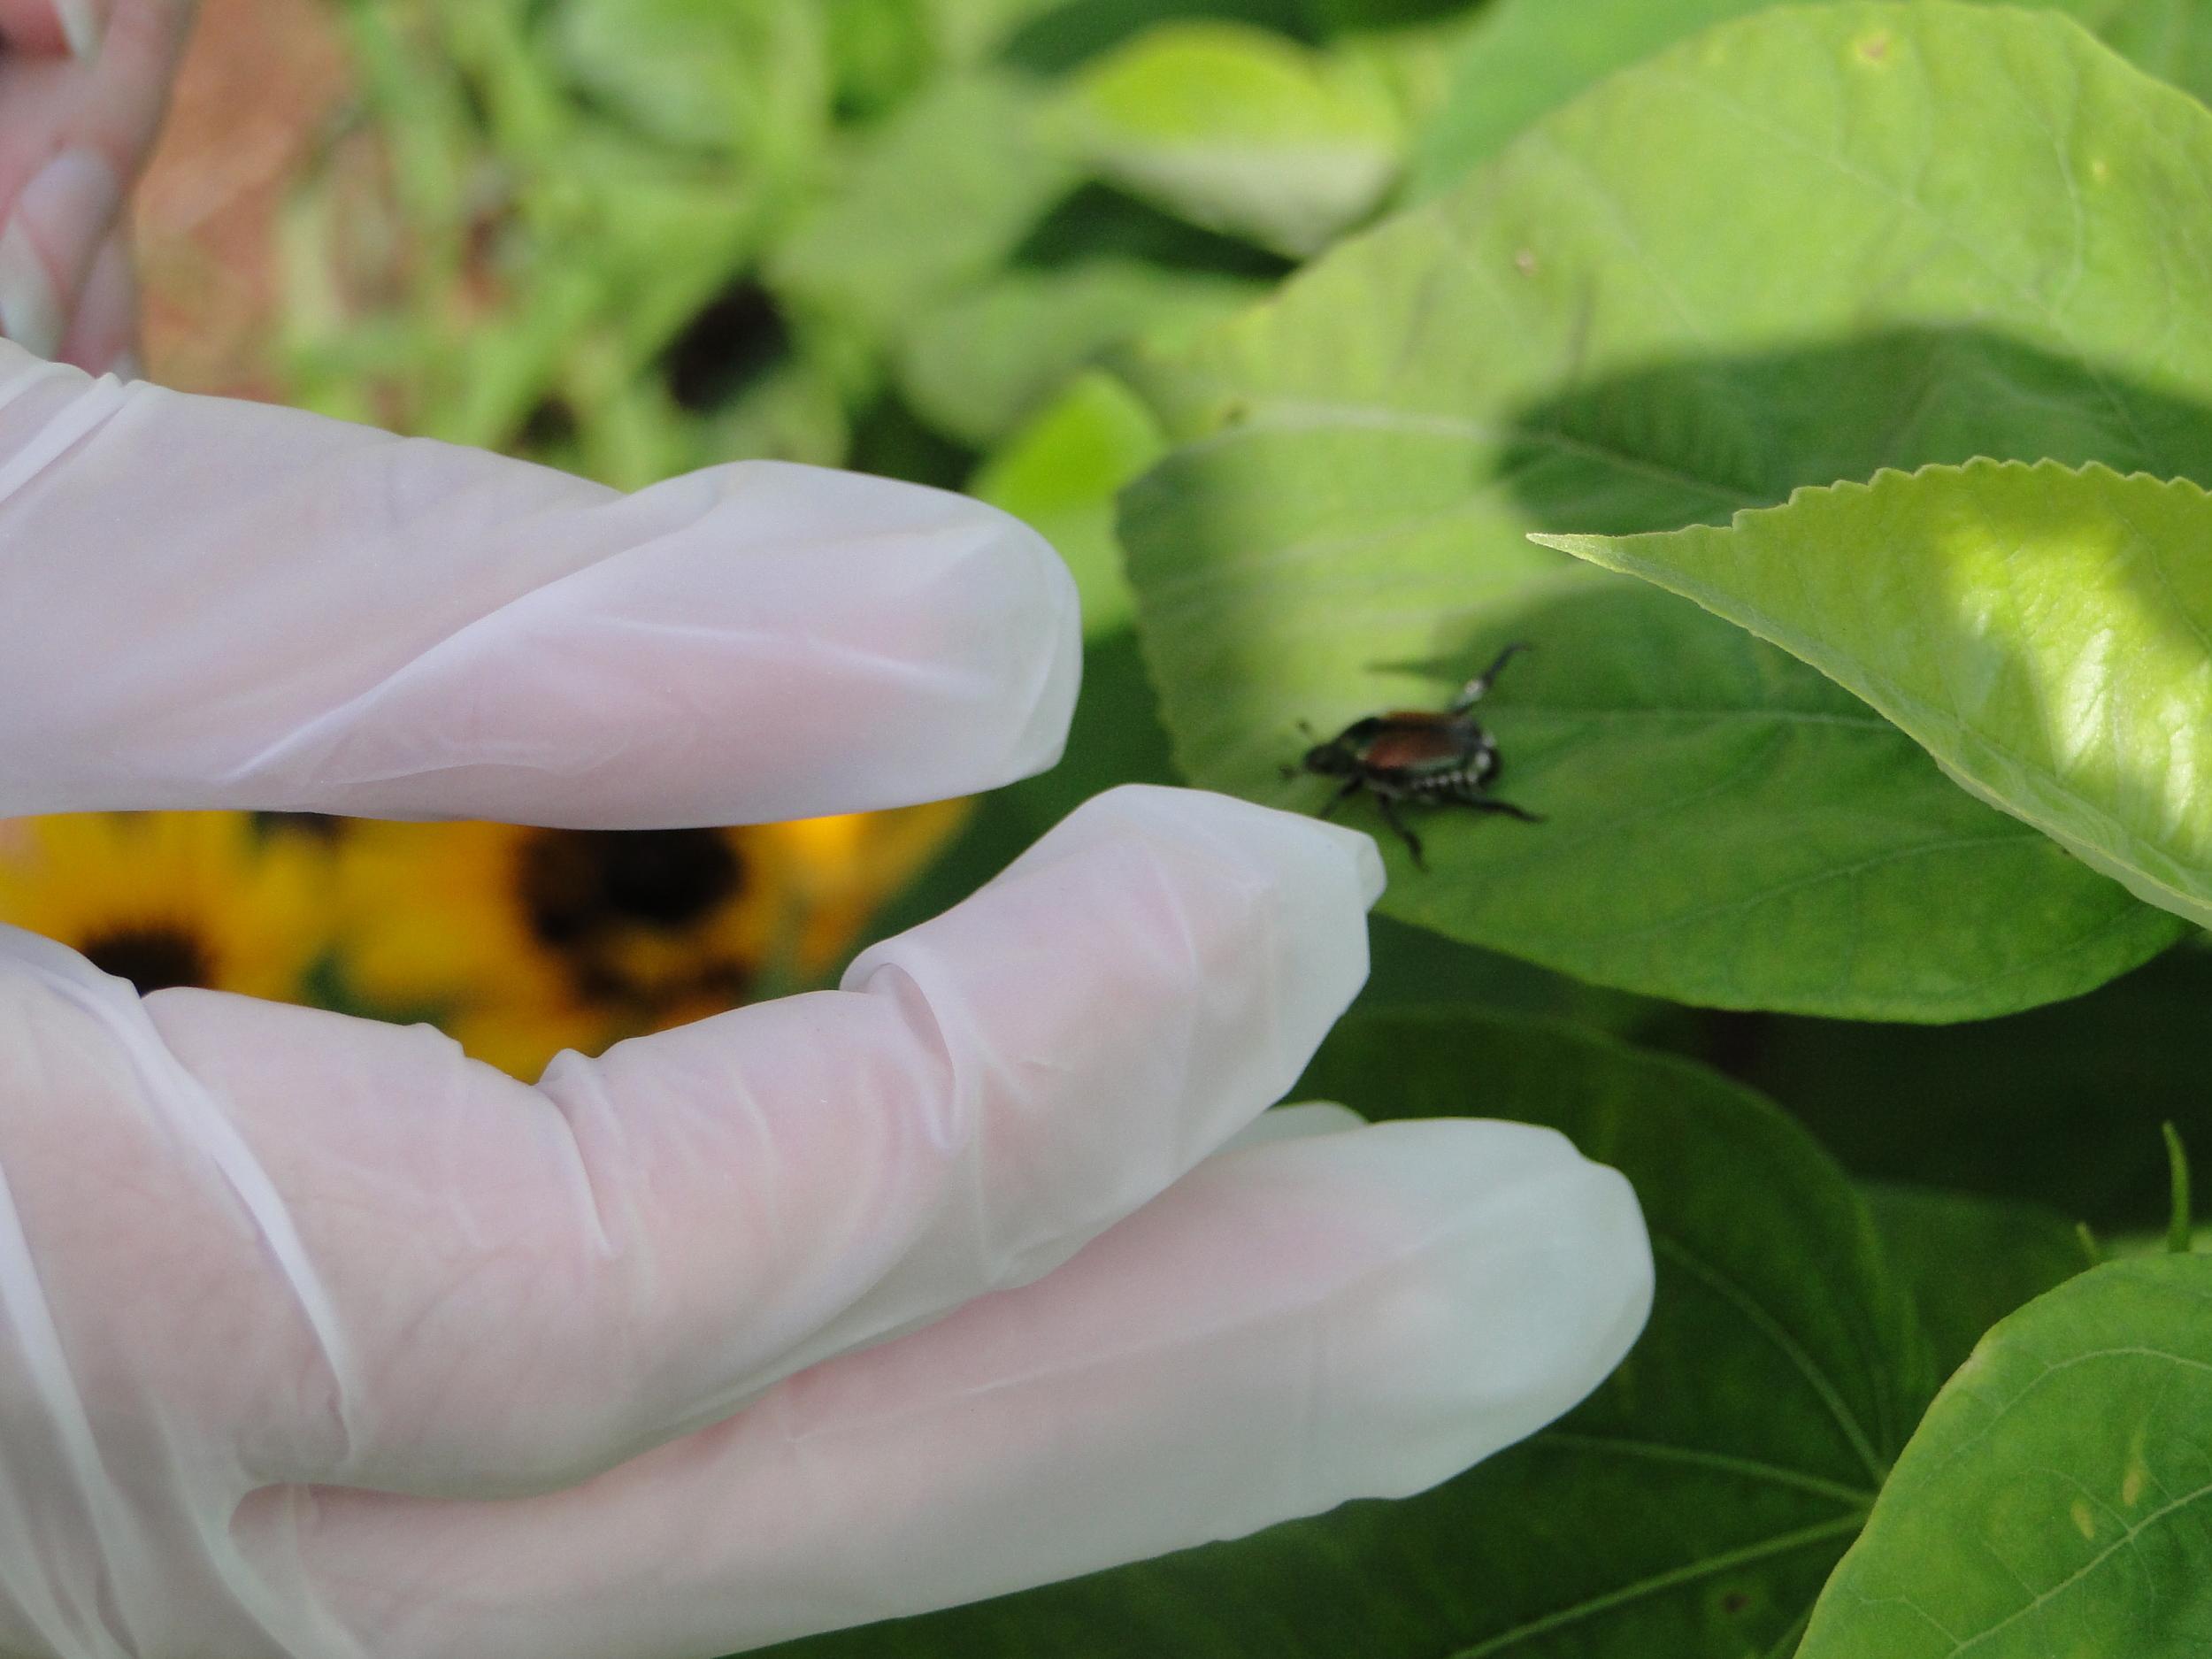 Step 4: Pick beetles off plants